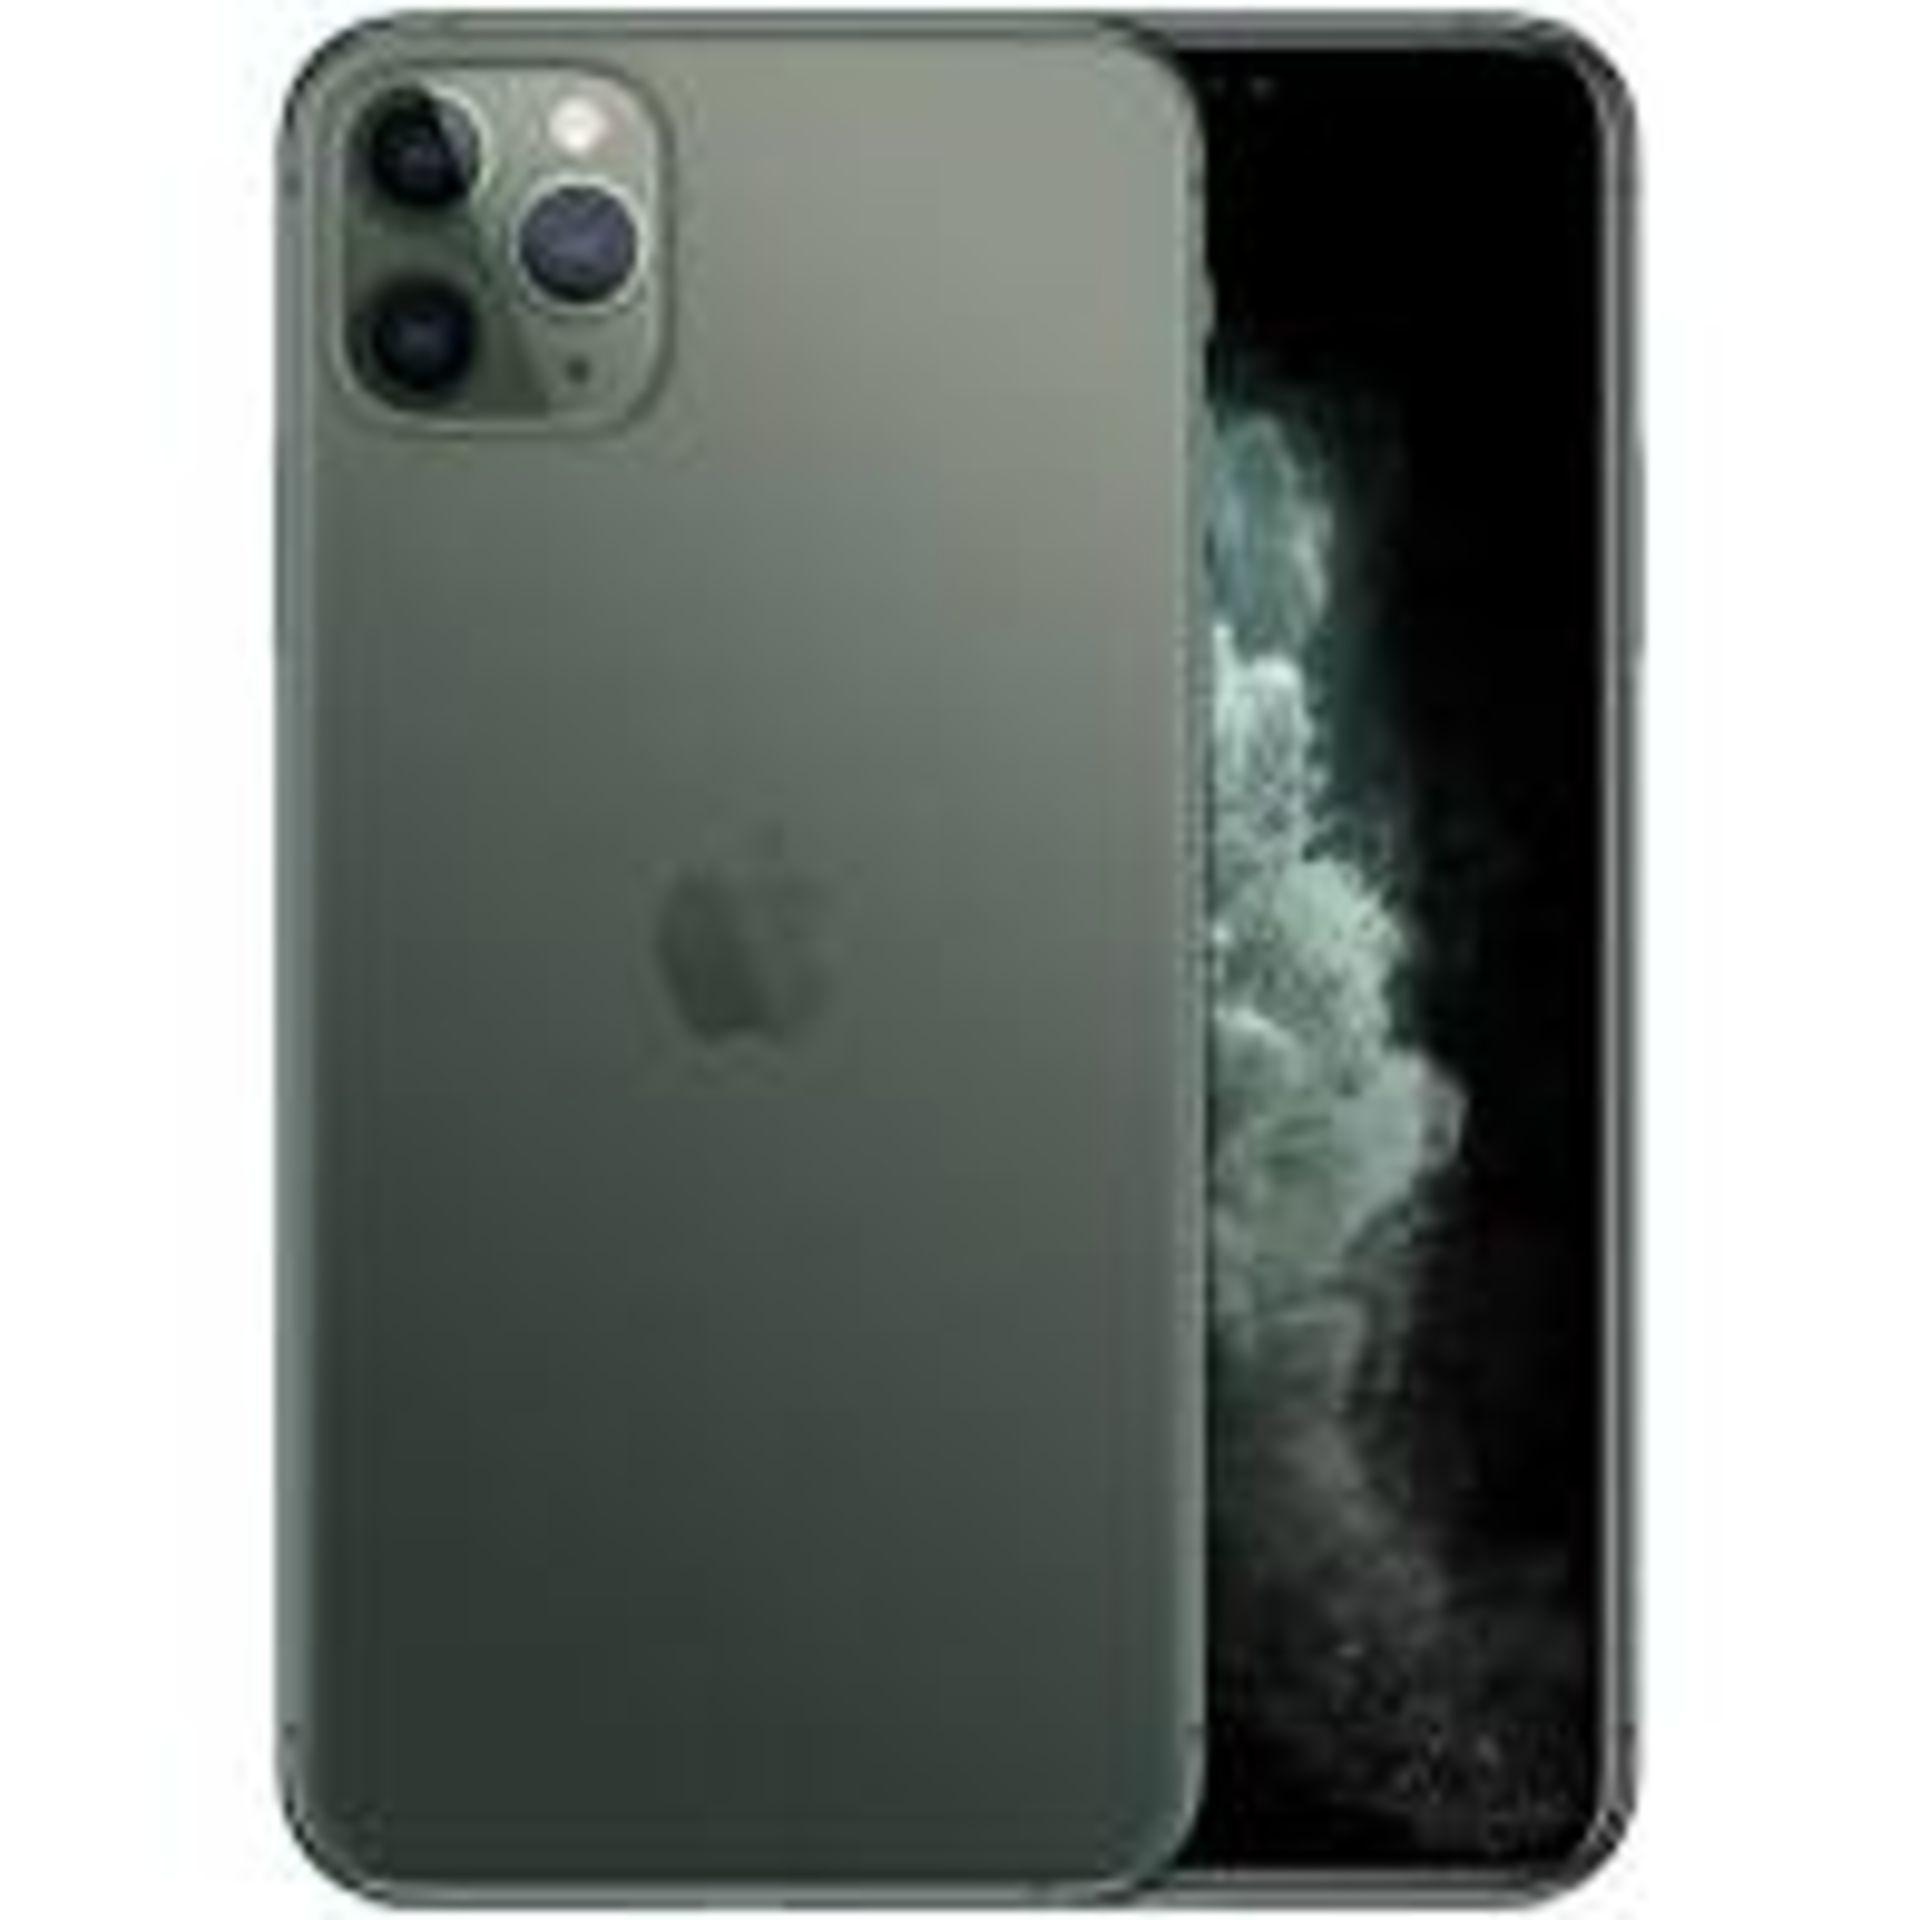 RRP £1,149 Apple iPhone 11 Pro Max 64GB Green